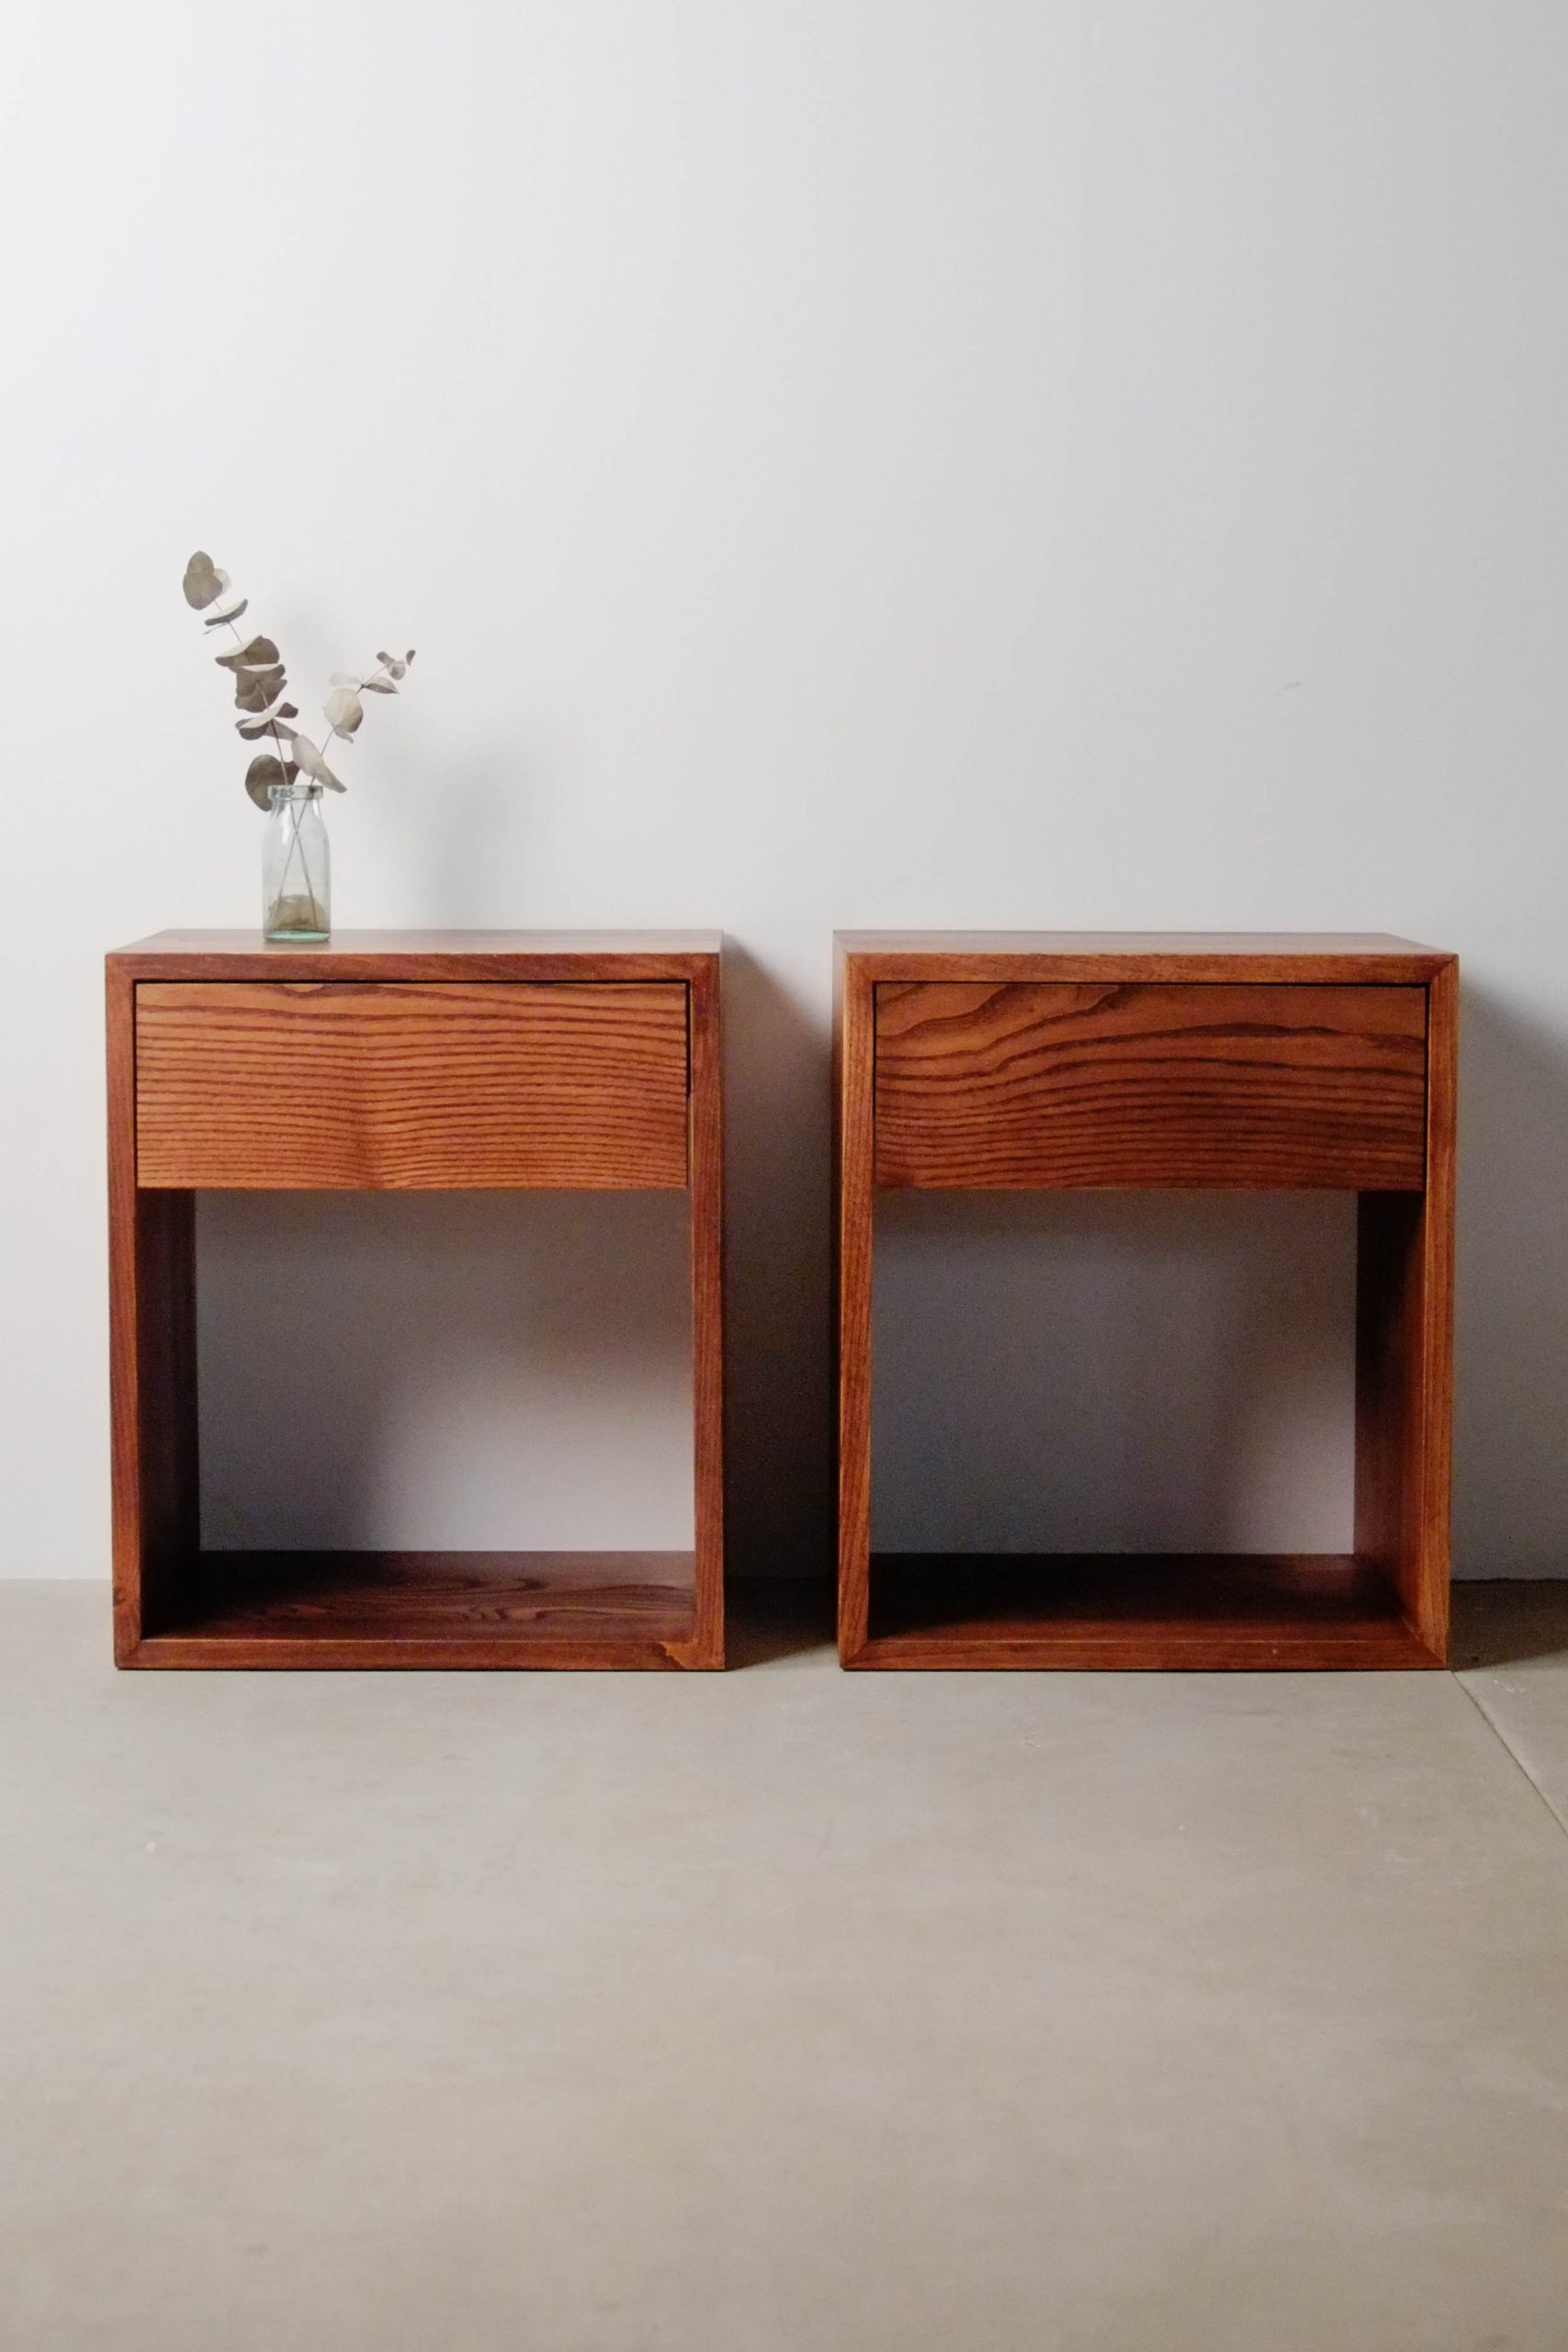 pareja de mesillas matrimonio cama doble madera cajon